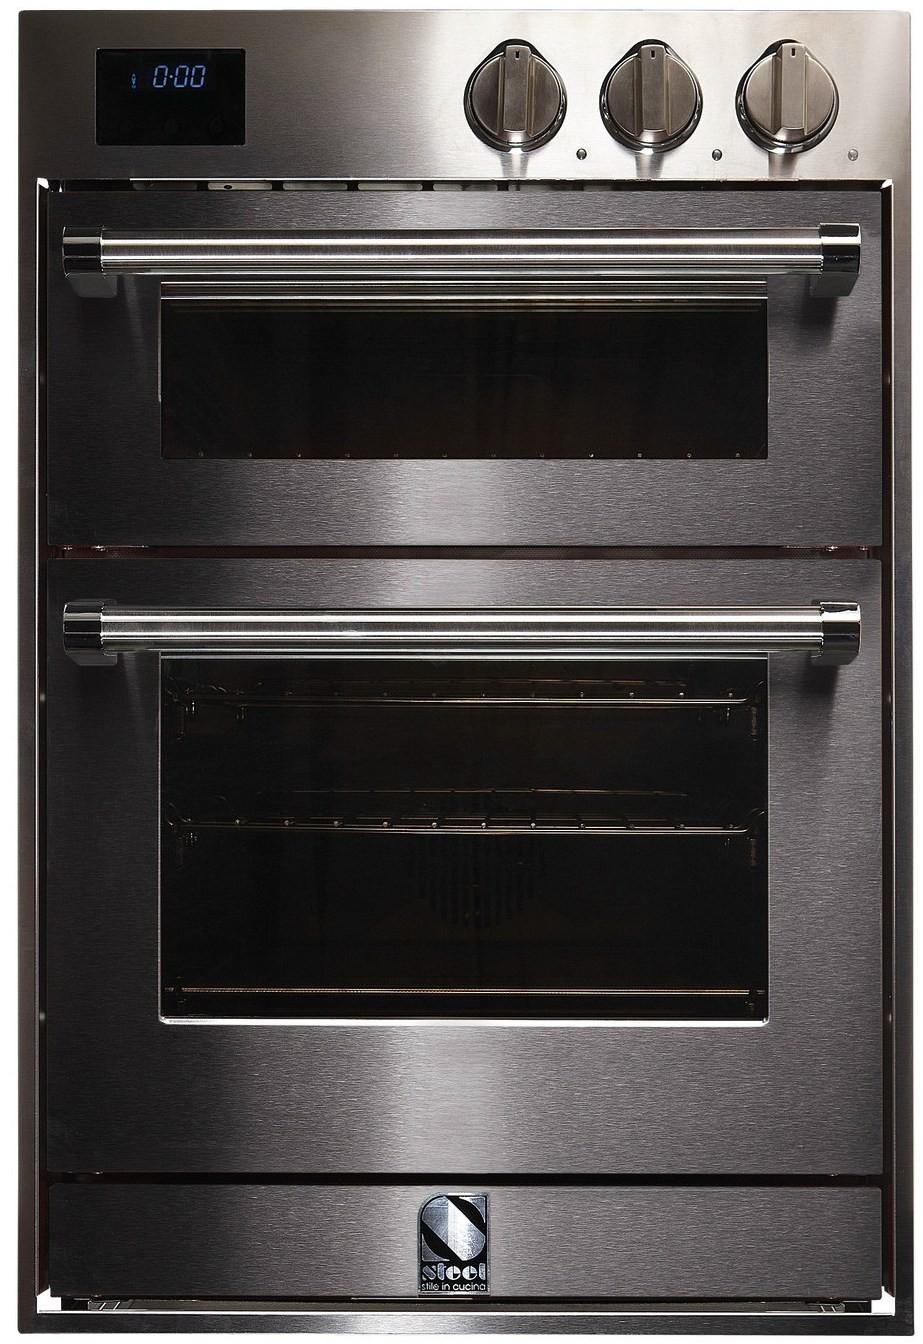 steel-cucine - FAB Appliances Italia